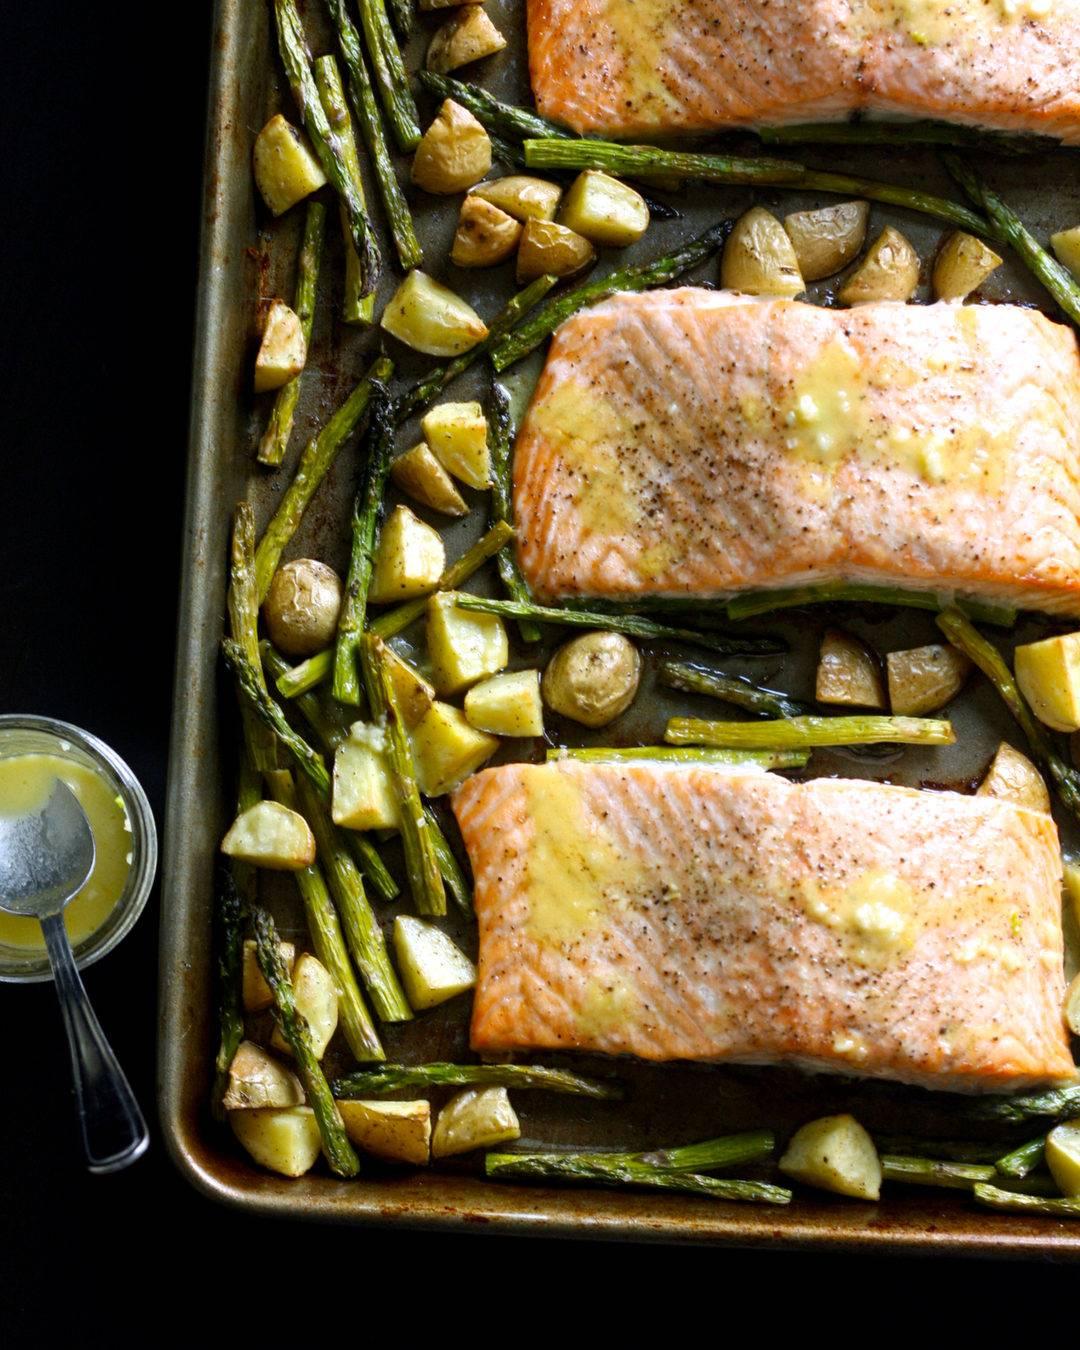 Roasted Salmon with Lemon Garlic Vinaigrette